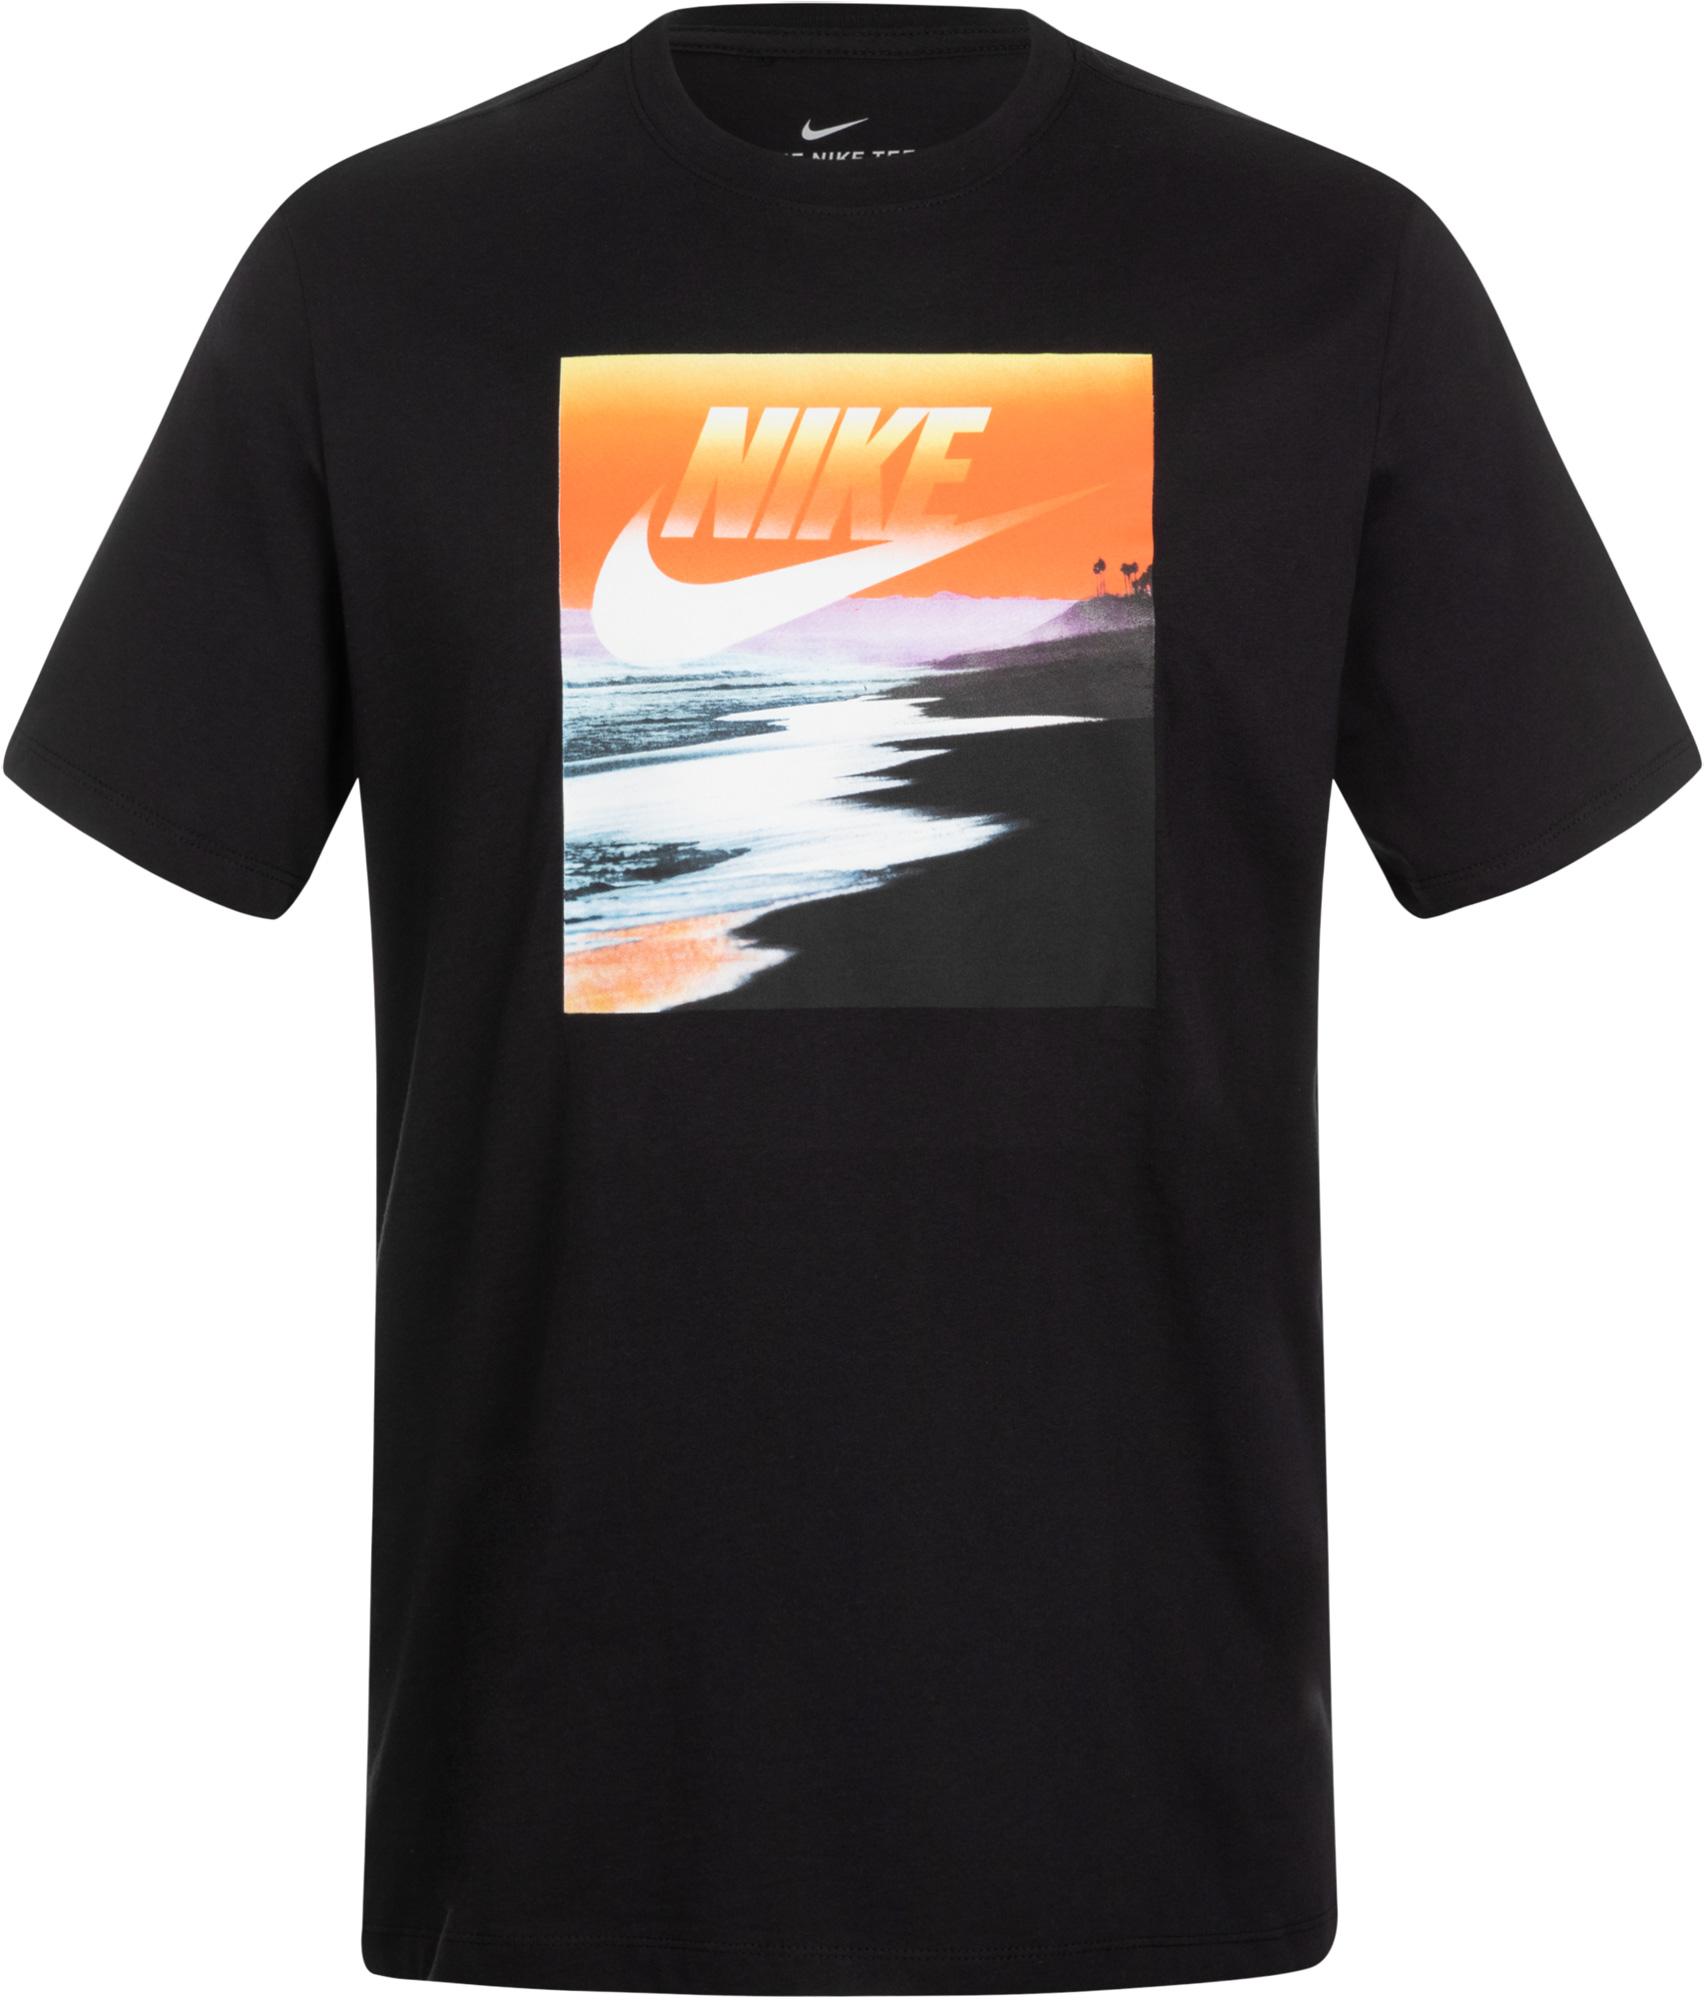 Nike Футболка мужская Nike Sportswear, размер 46-48